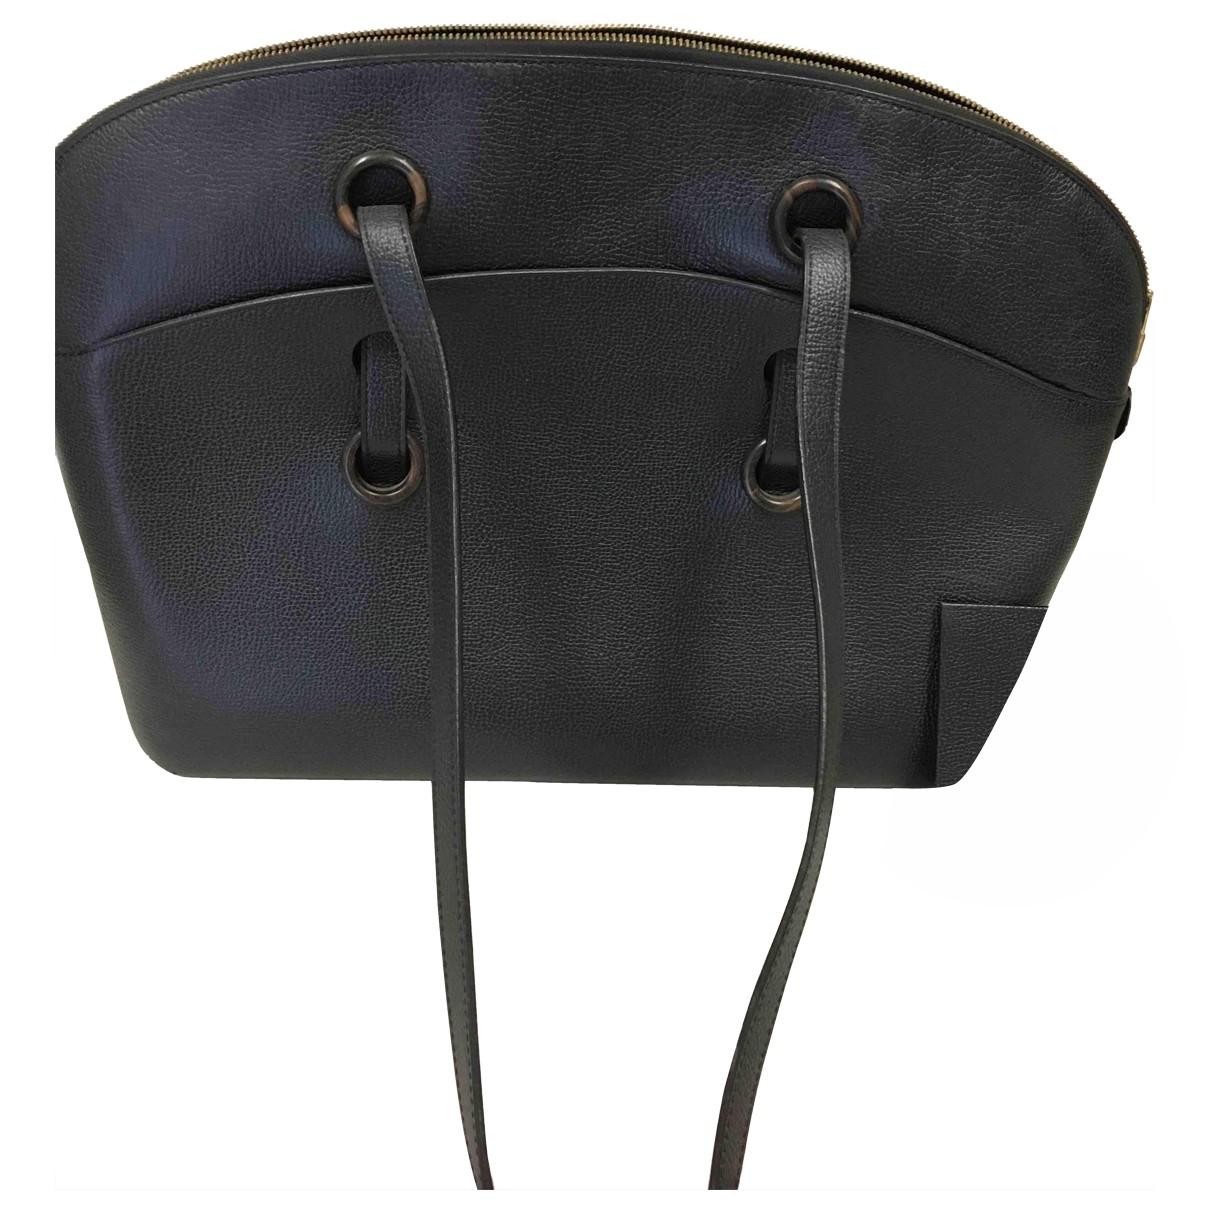 Delvaux \N Handtasche in  Schwarz Leder